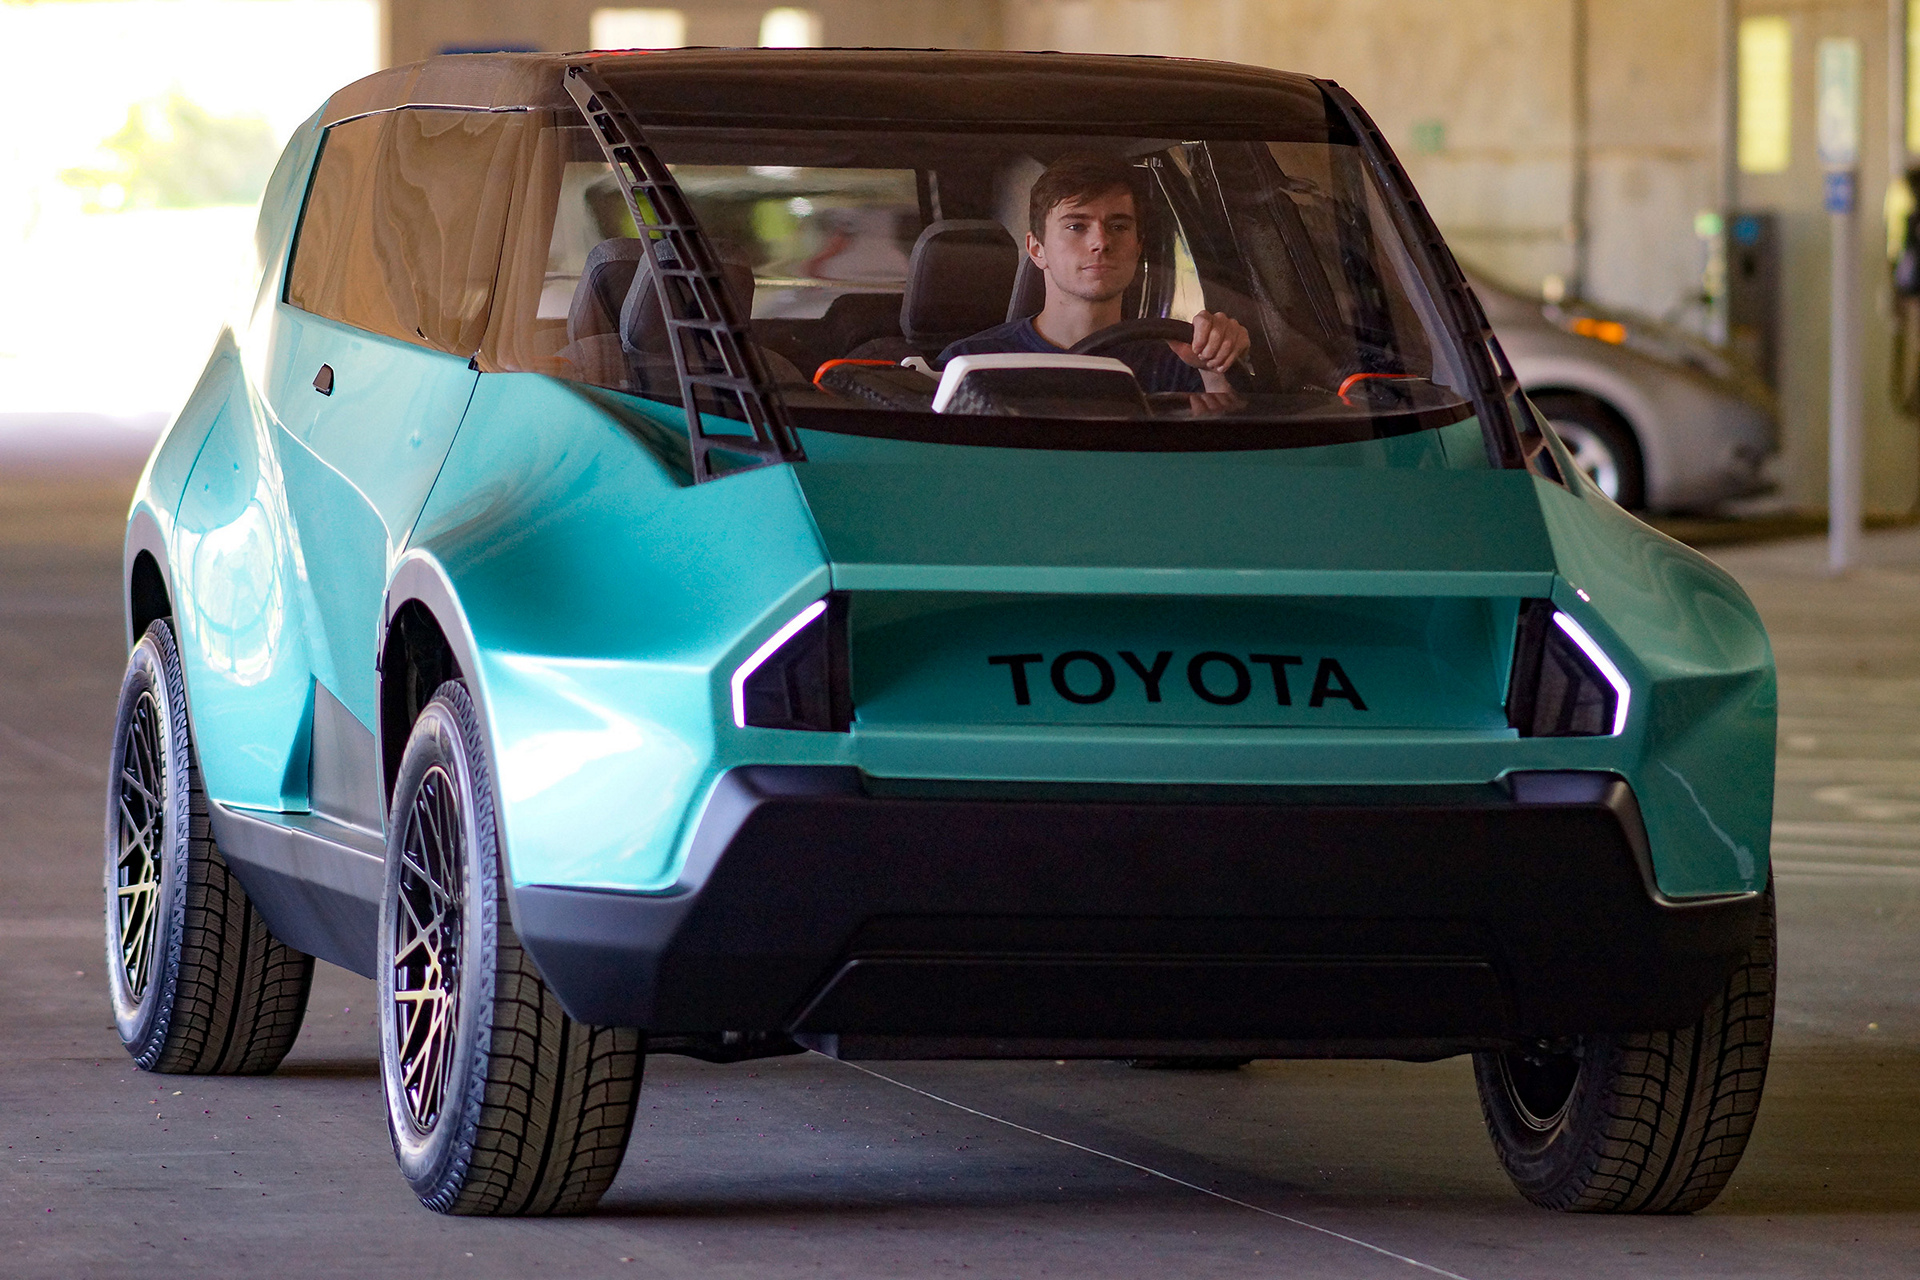 Toyota And Clemson Partner To Unveil Gen Z Focused Concept